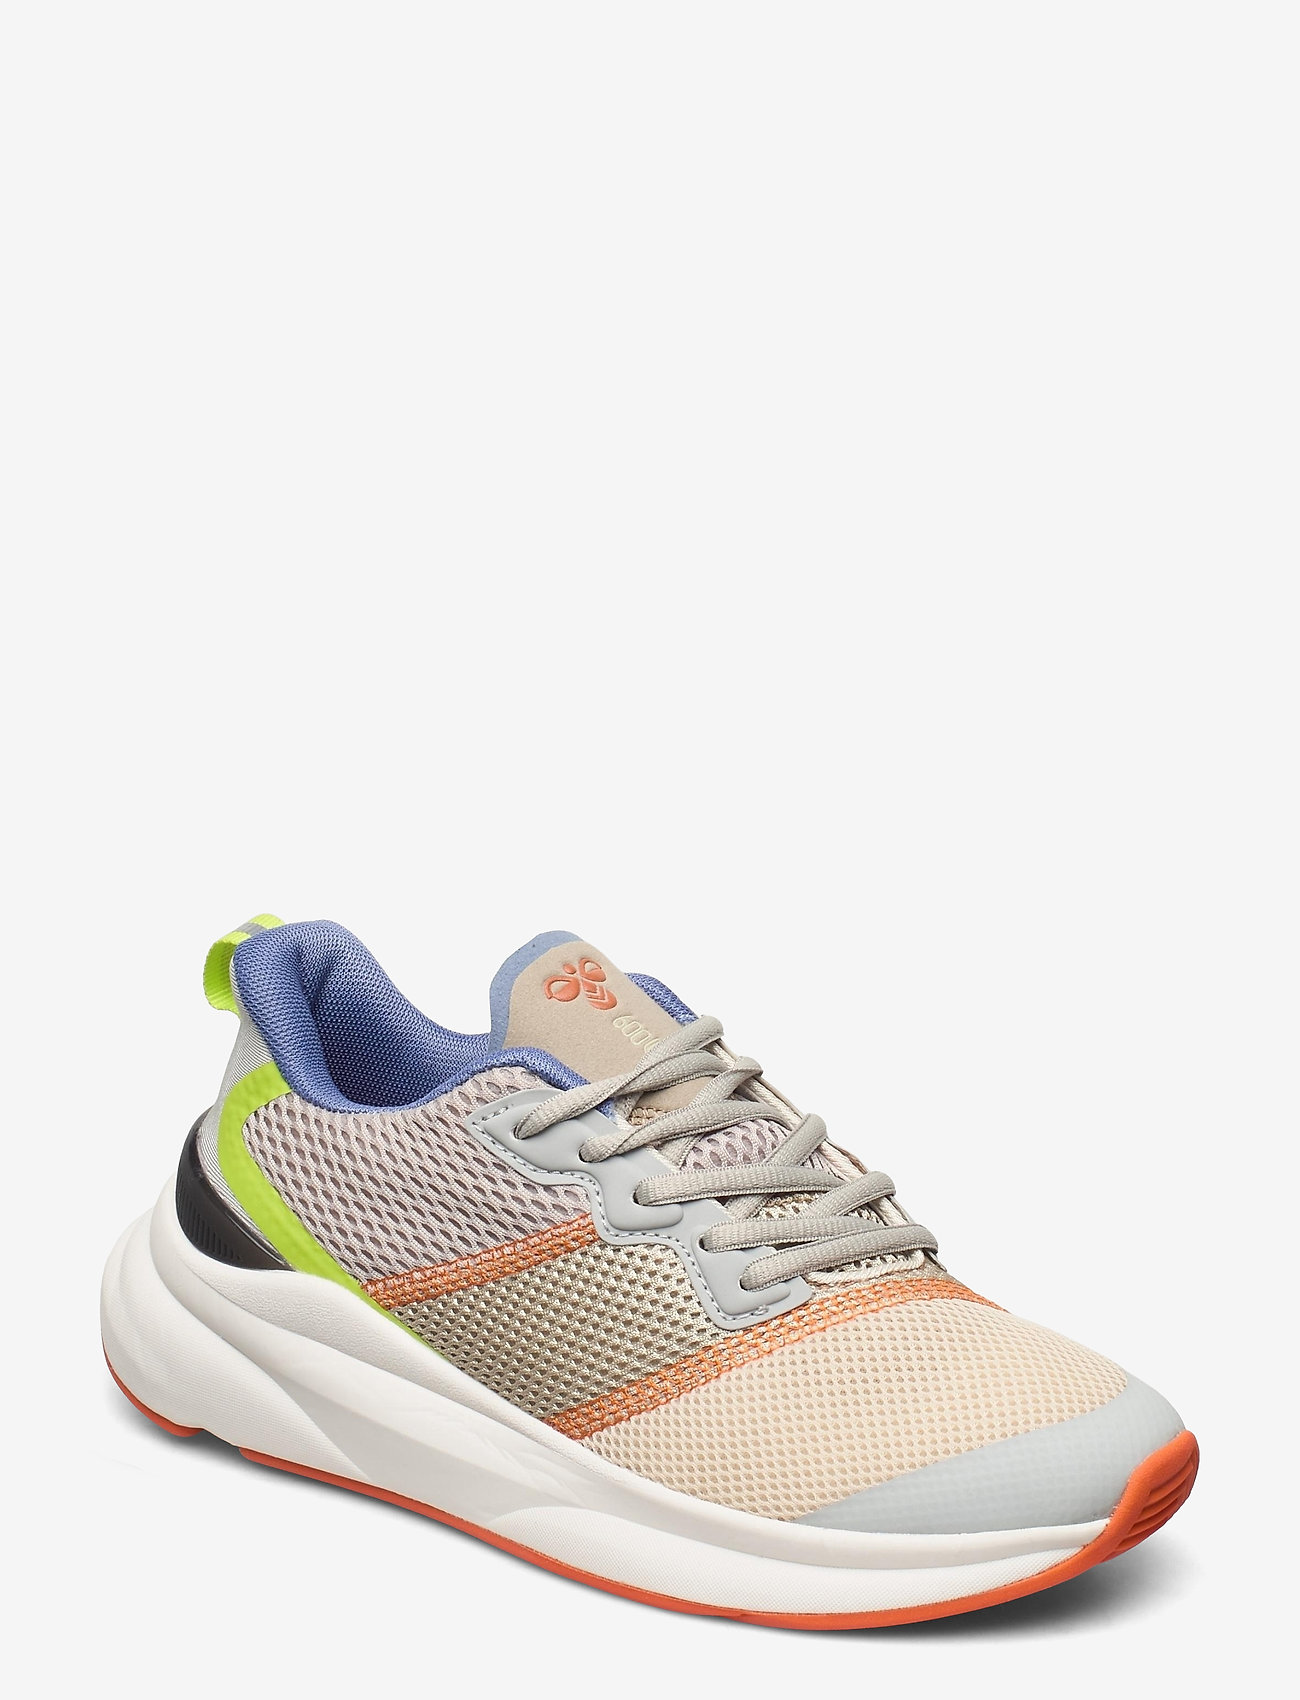 Hummel - REACH LX 600 - laag sneakers - marshmallow - 0